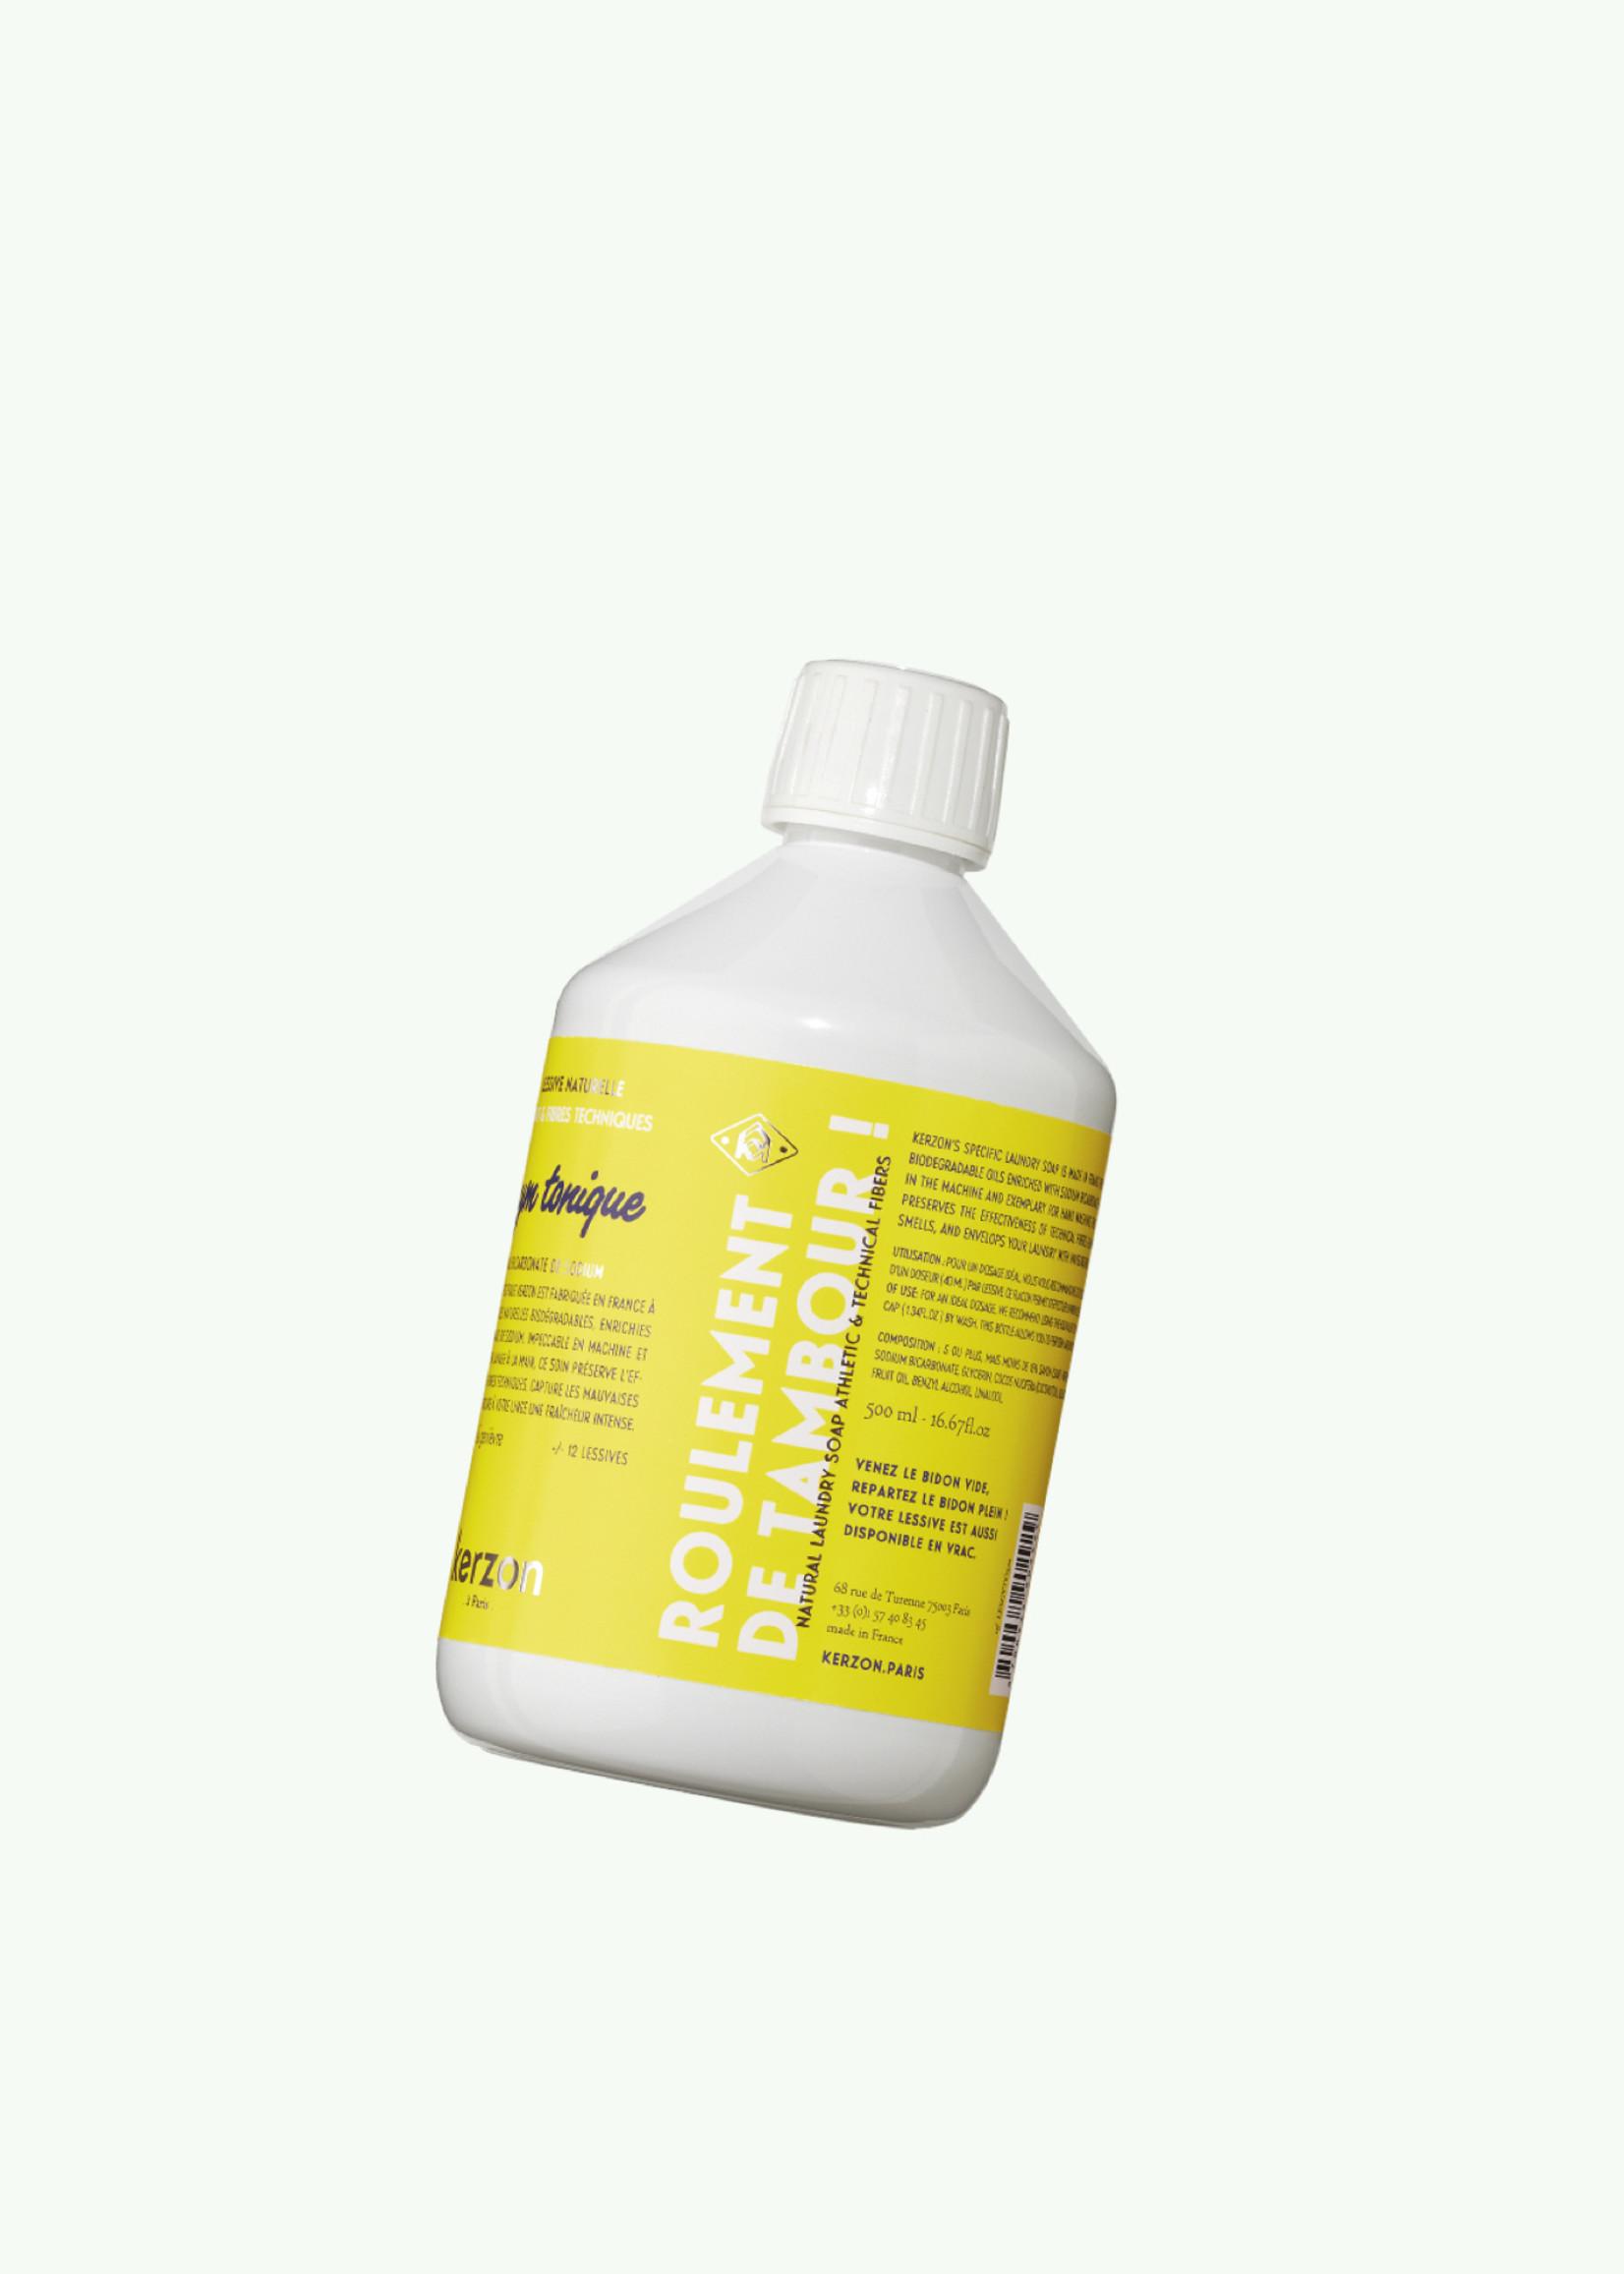 Kerzon Kerzon - Gym Tonic - Laundry detergent for sportswear 500 ml